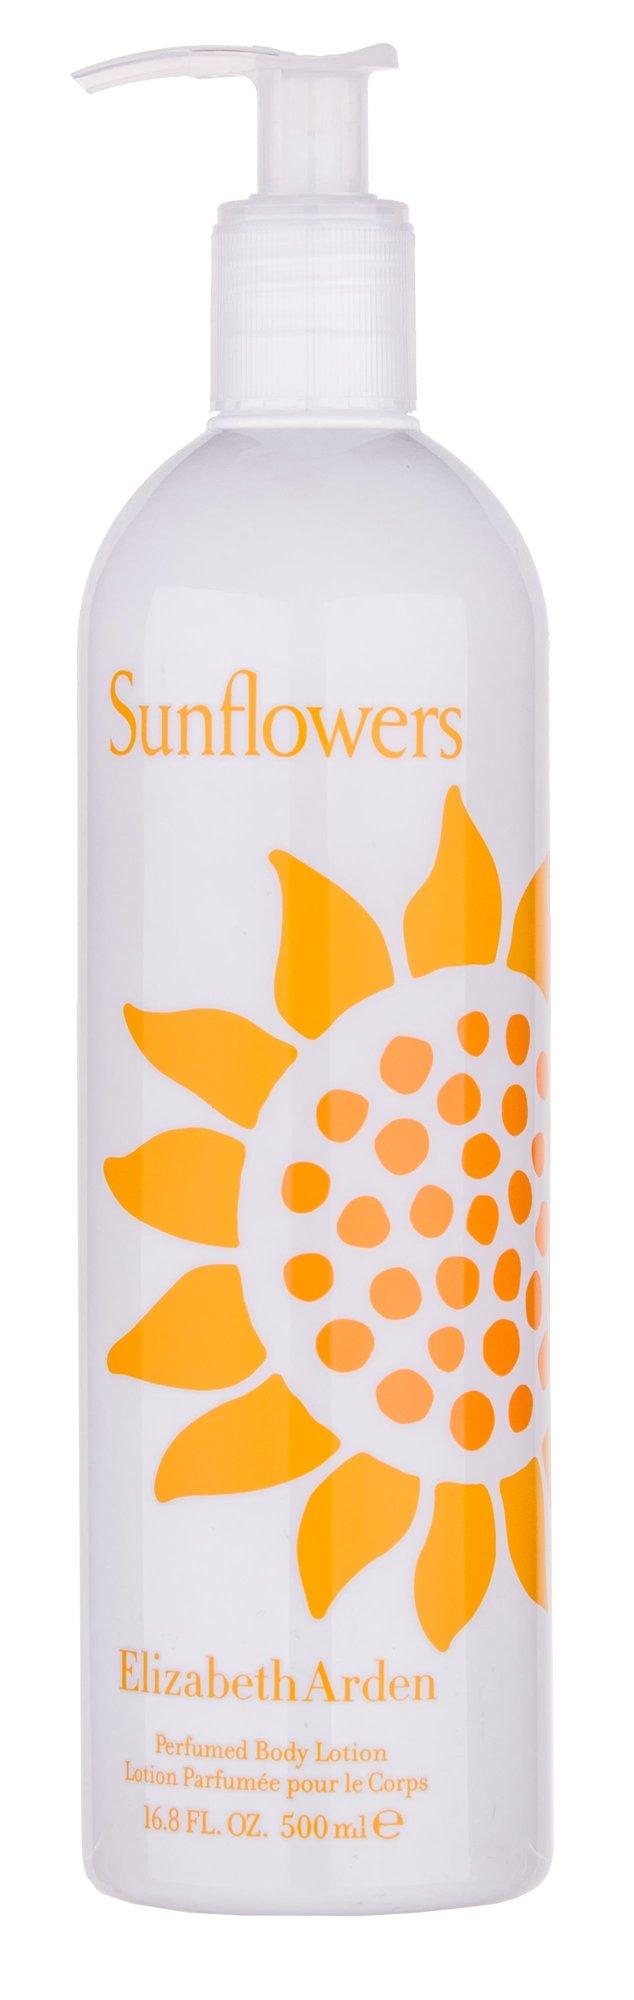 Kūno losjonas Elizabeth Arden Sunflowers